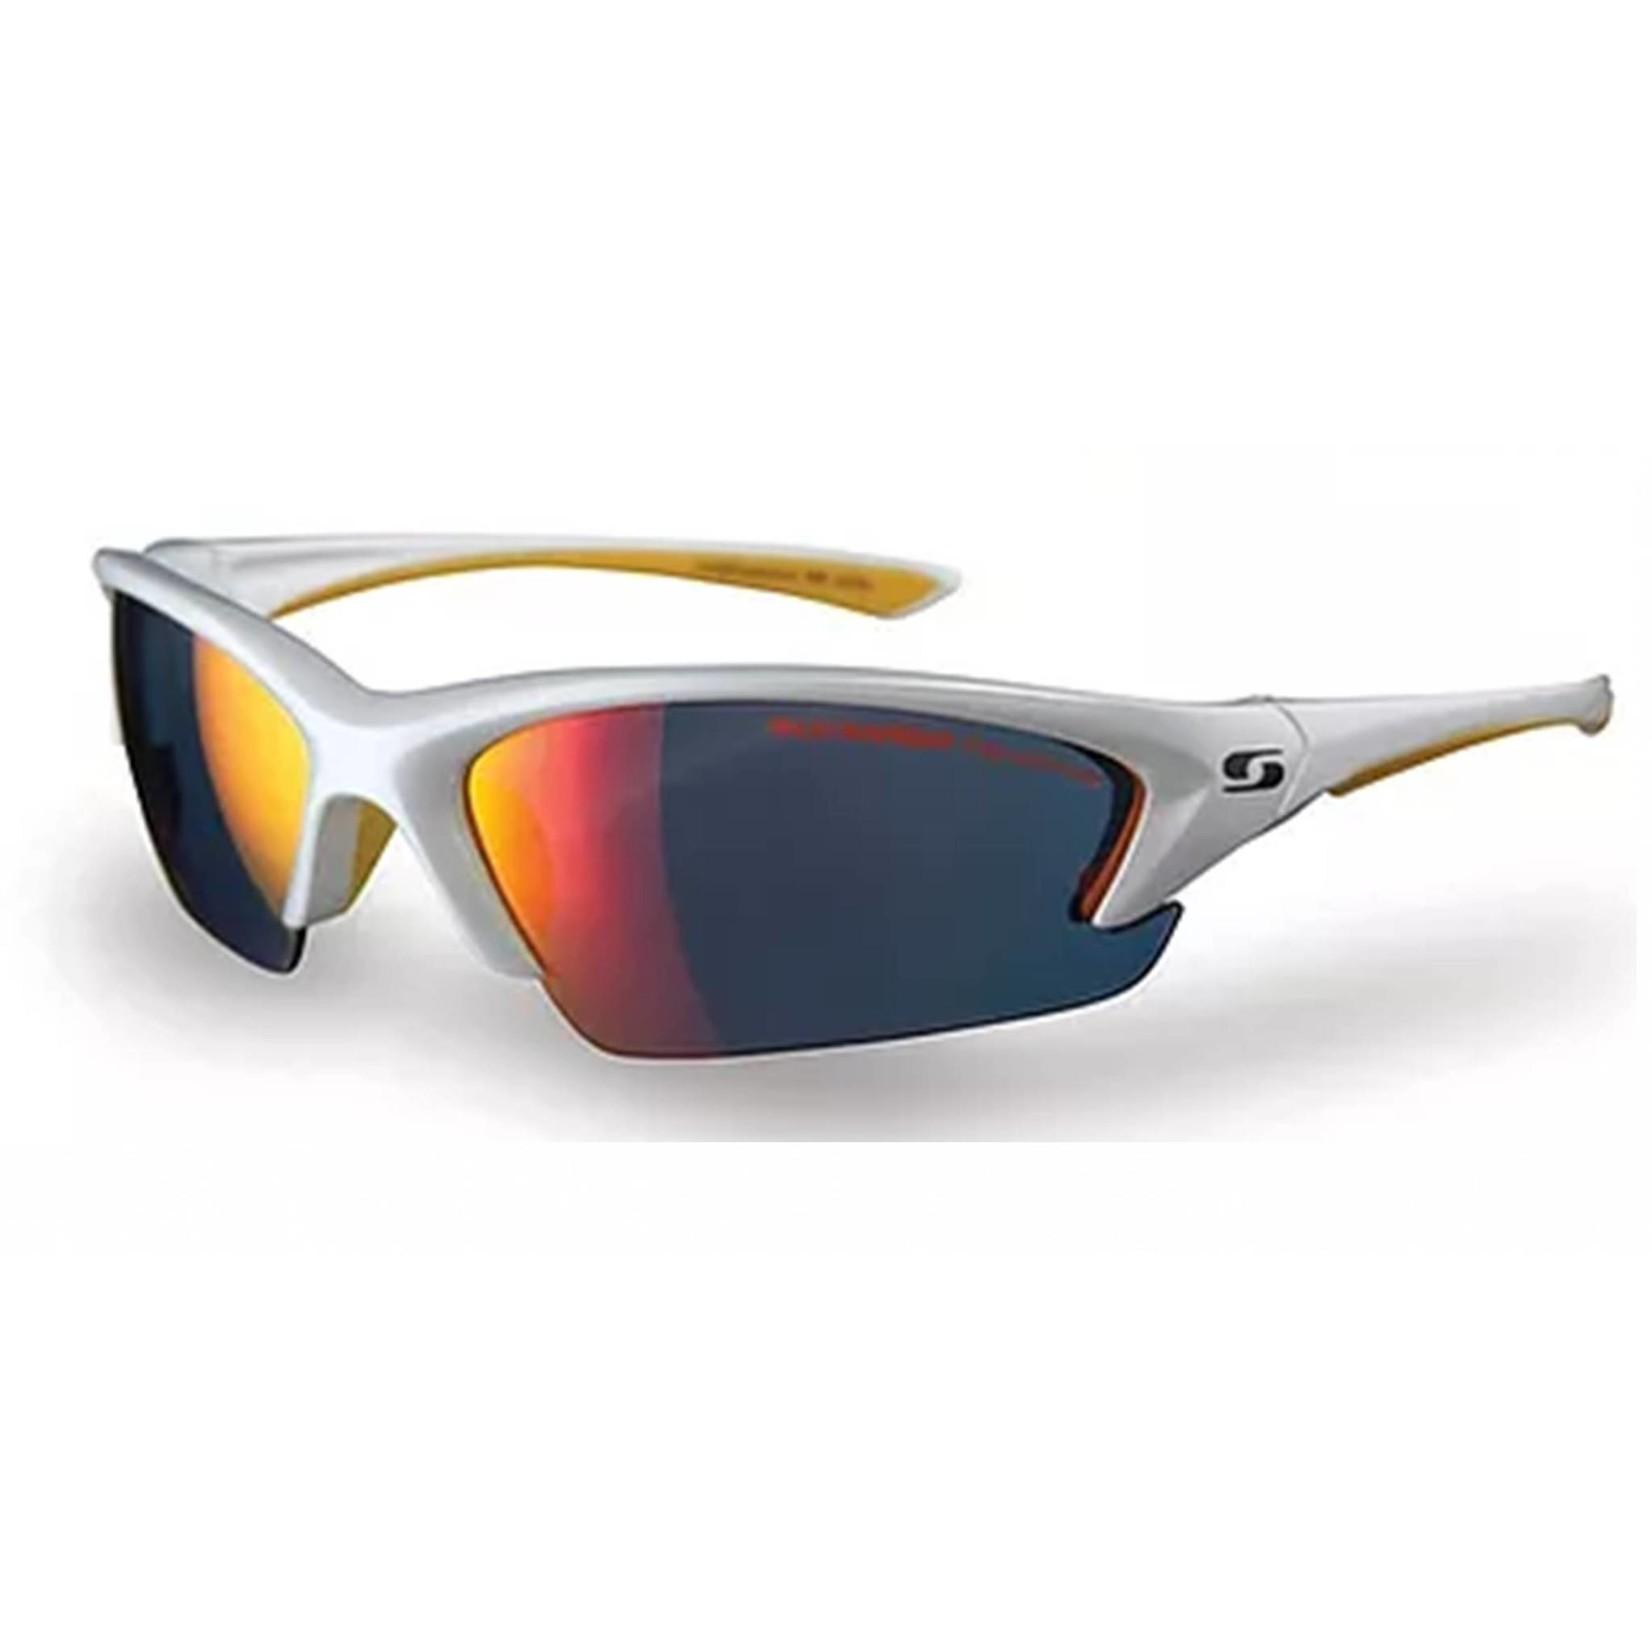 Sunwise Equinox RM Sunglasses Grey/Orange